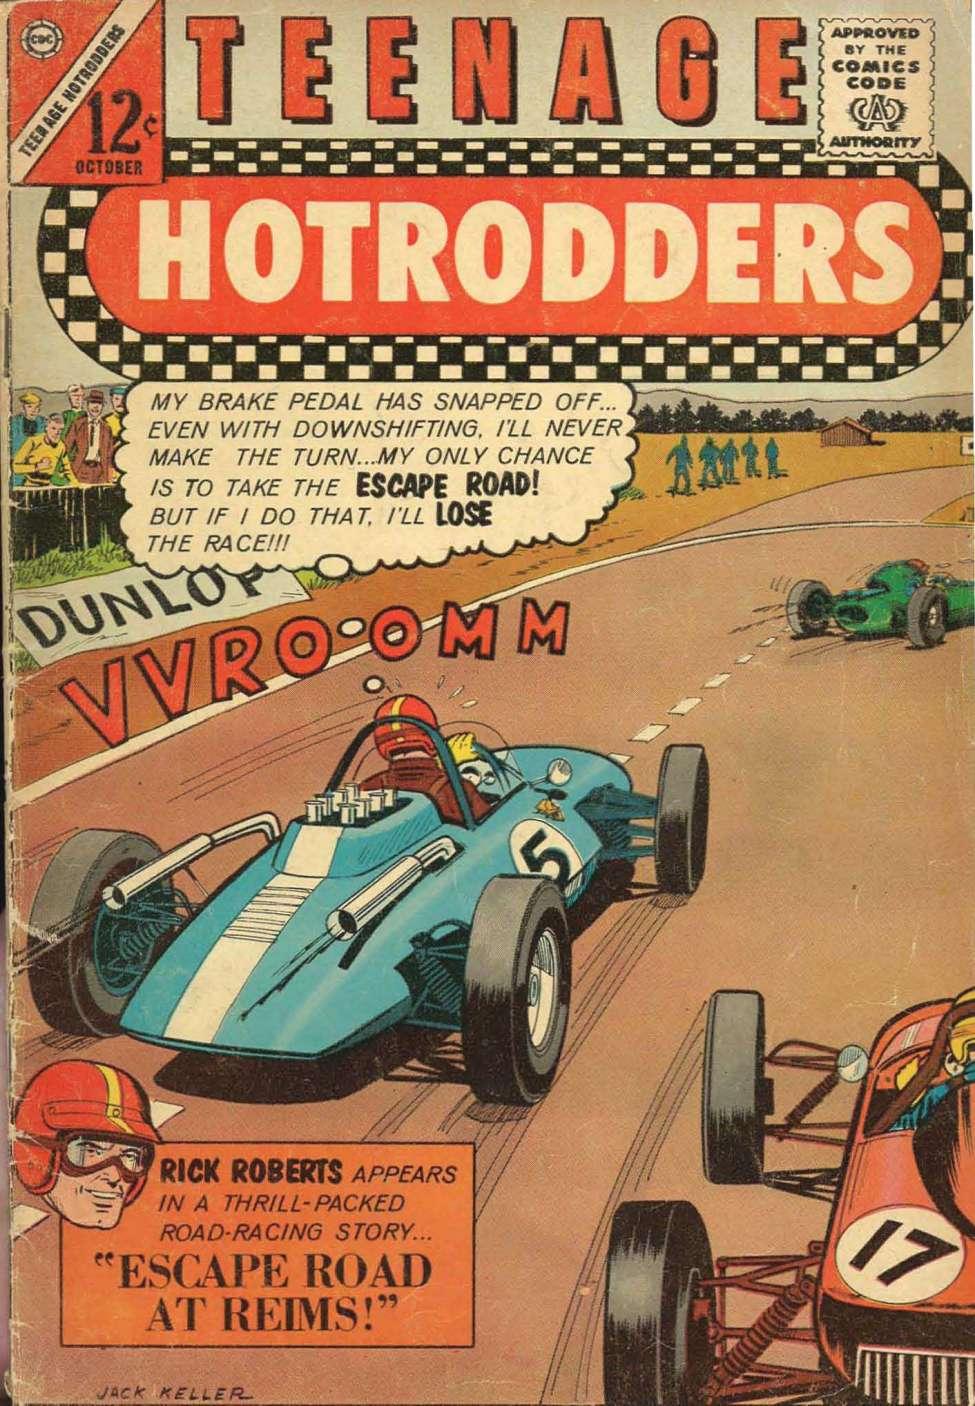 Teenage Hotrodders #4 (Charlton) - Comic Book Plus